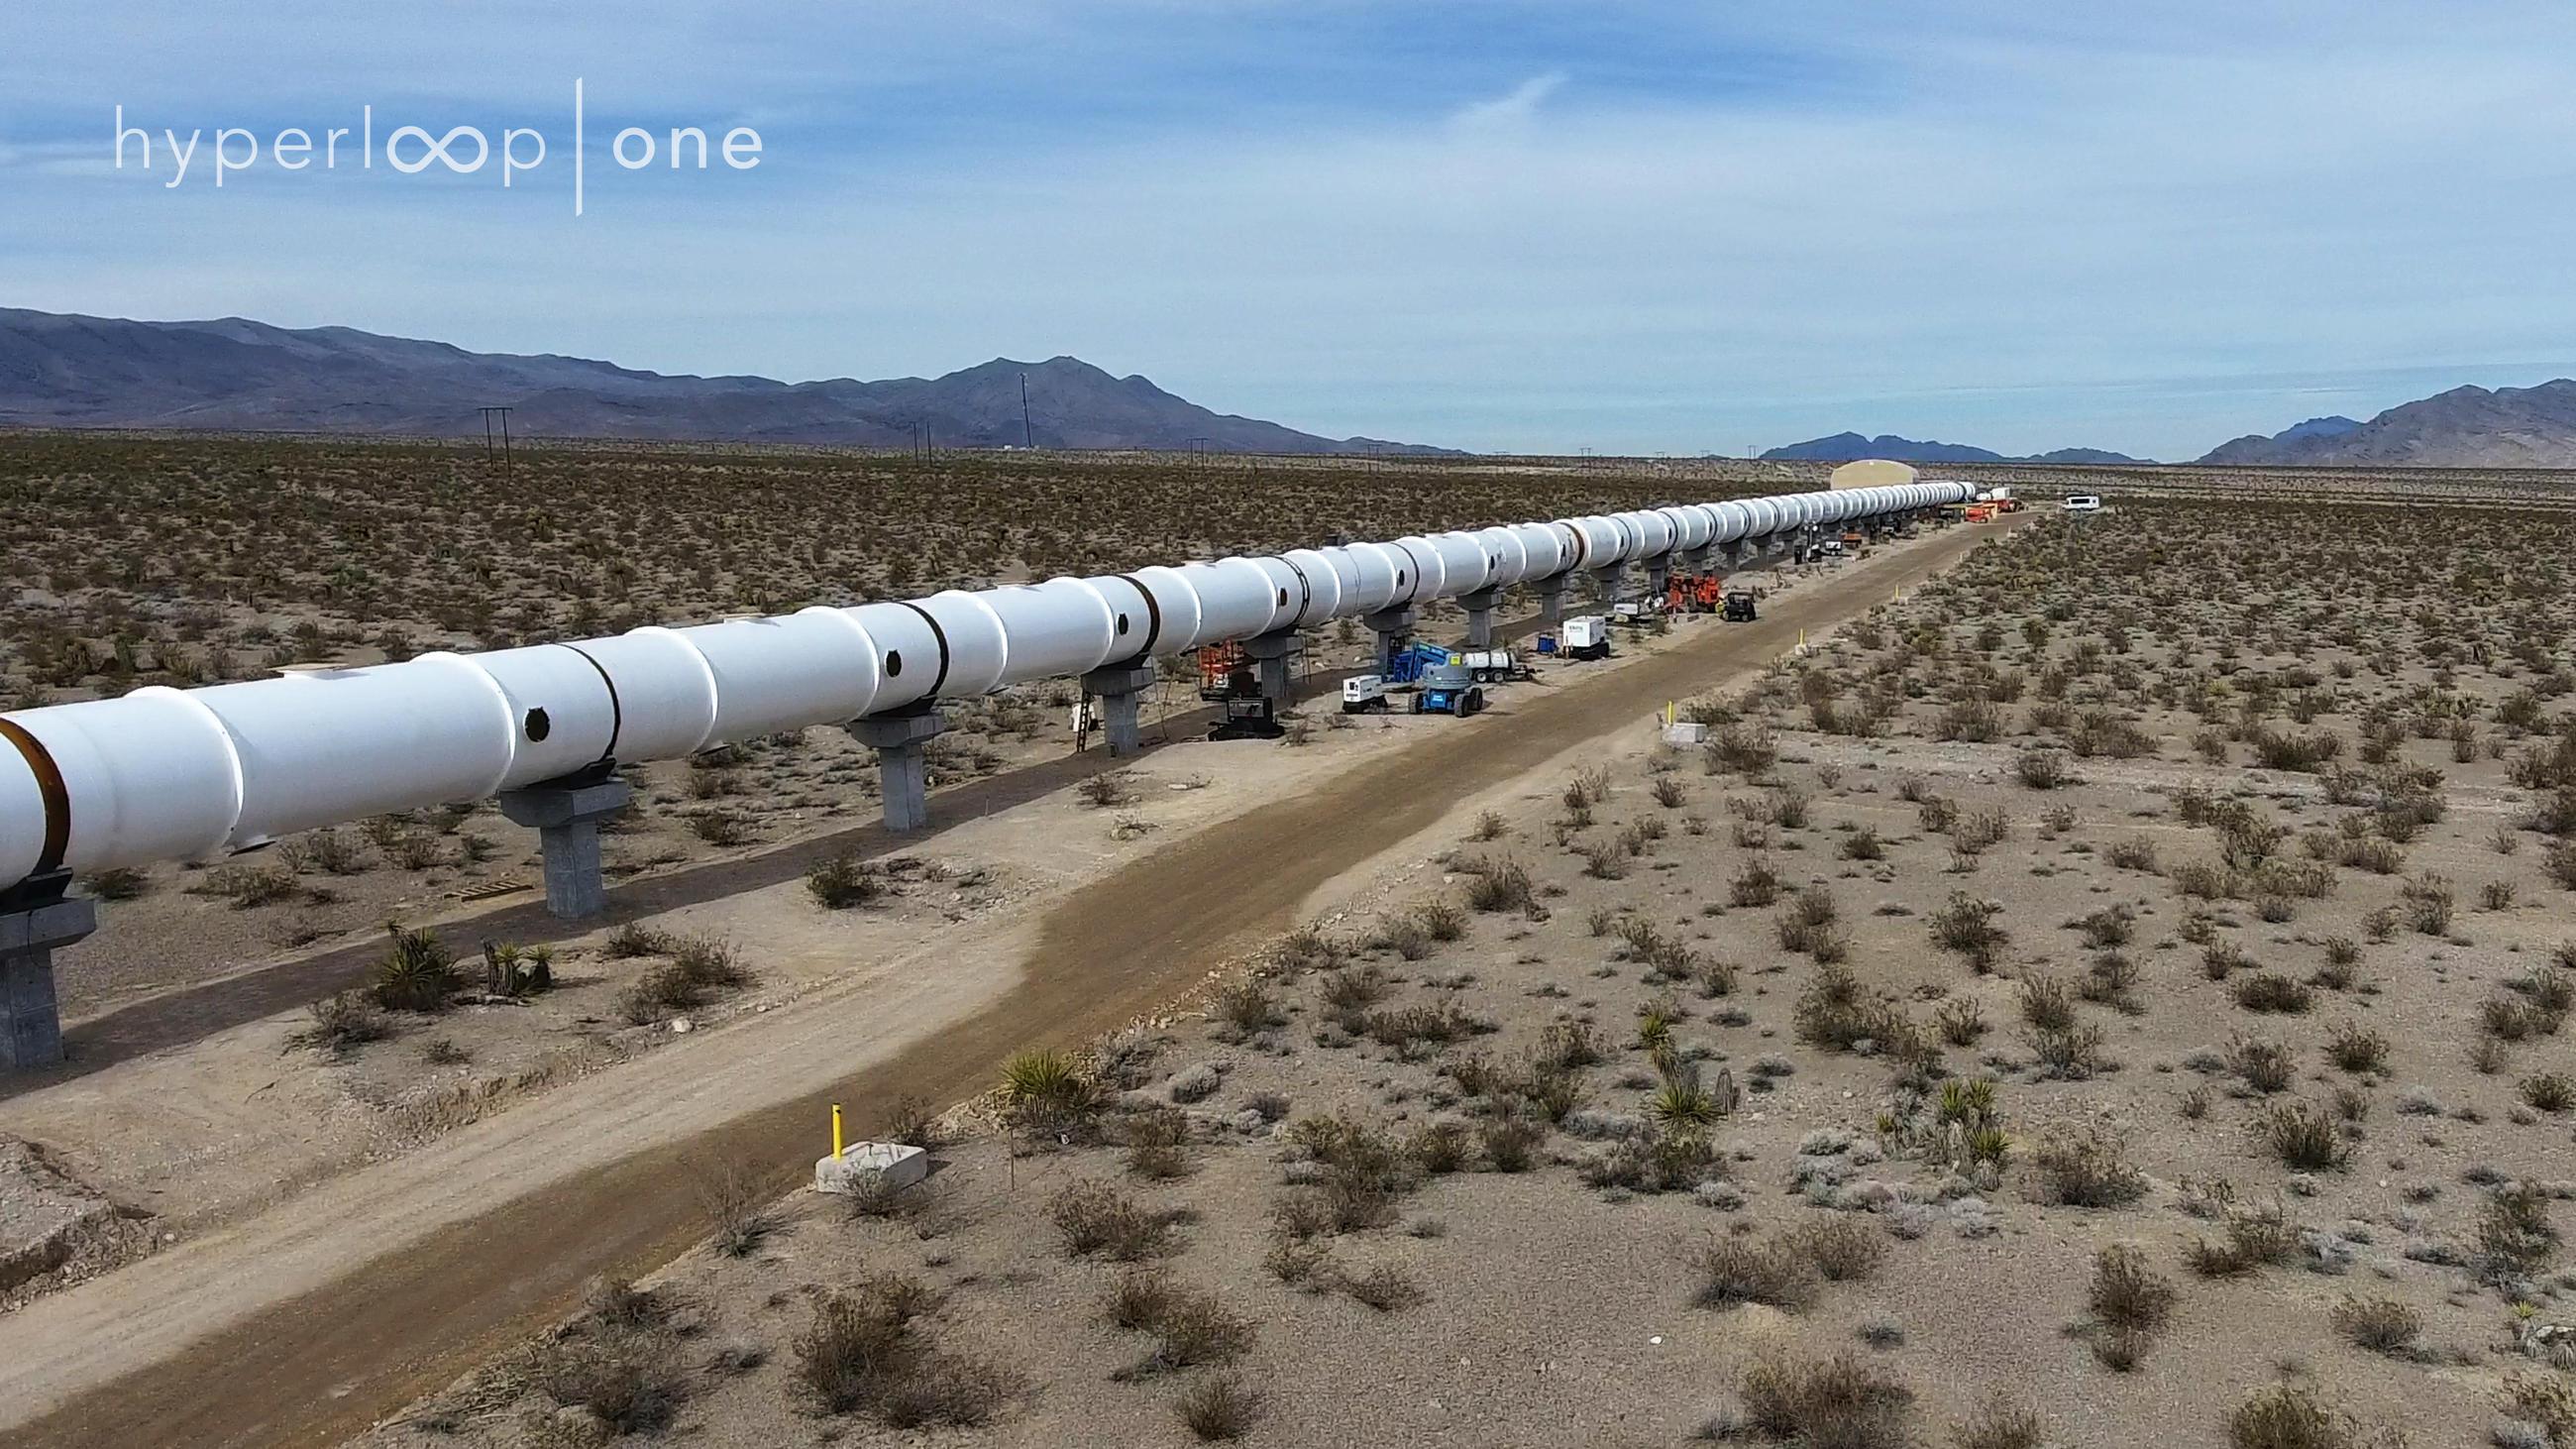 hyperloop-one-test-track-nevada-3